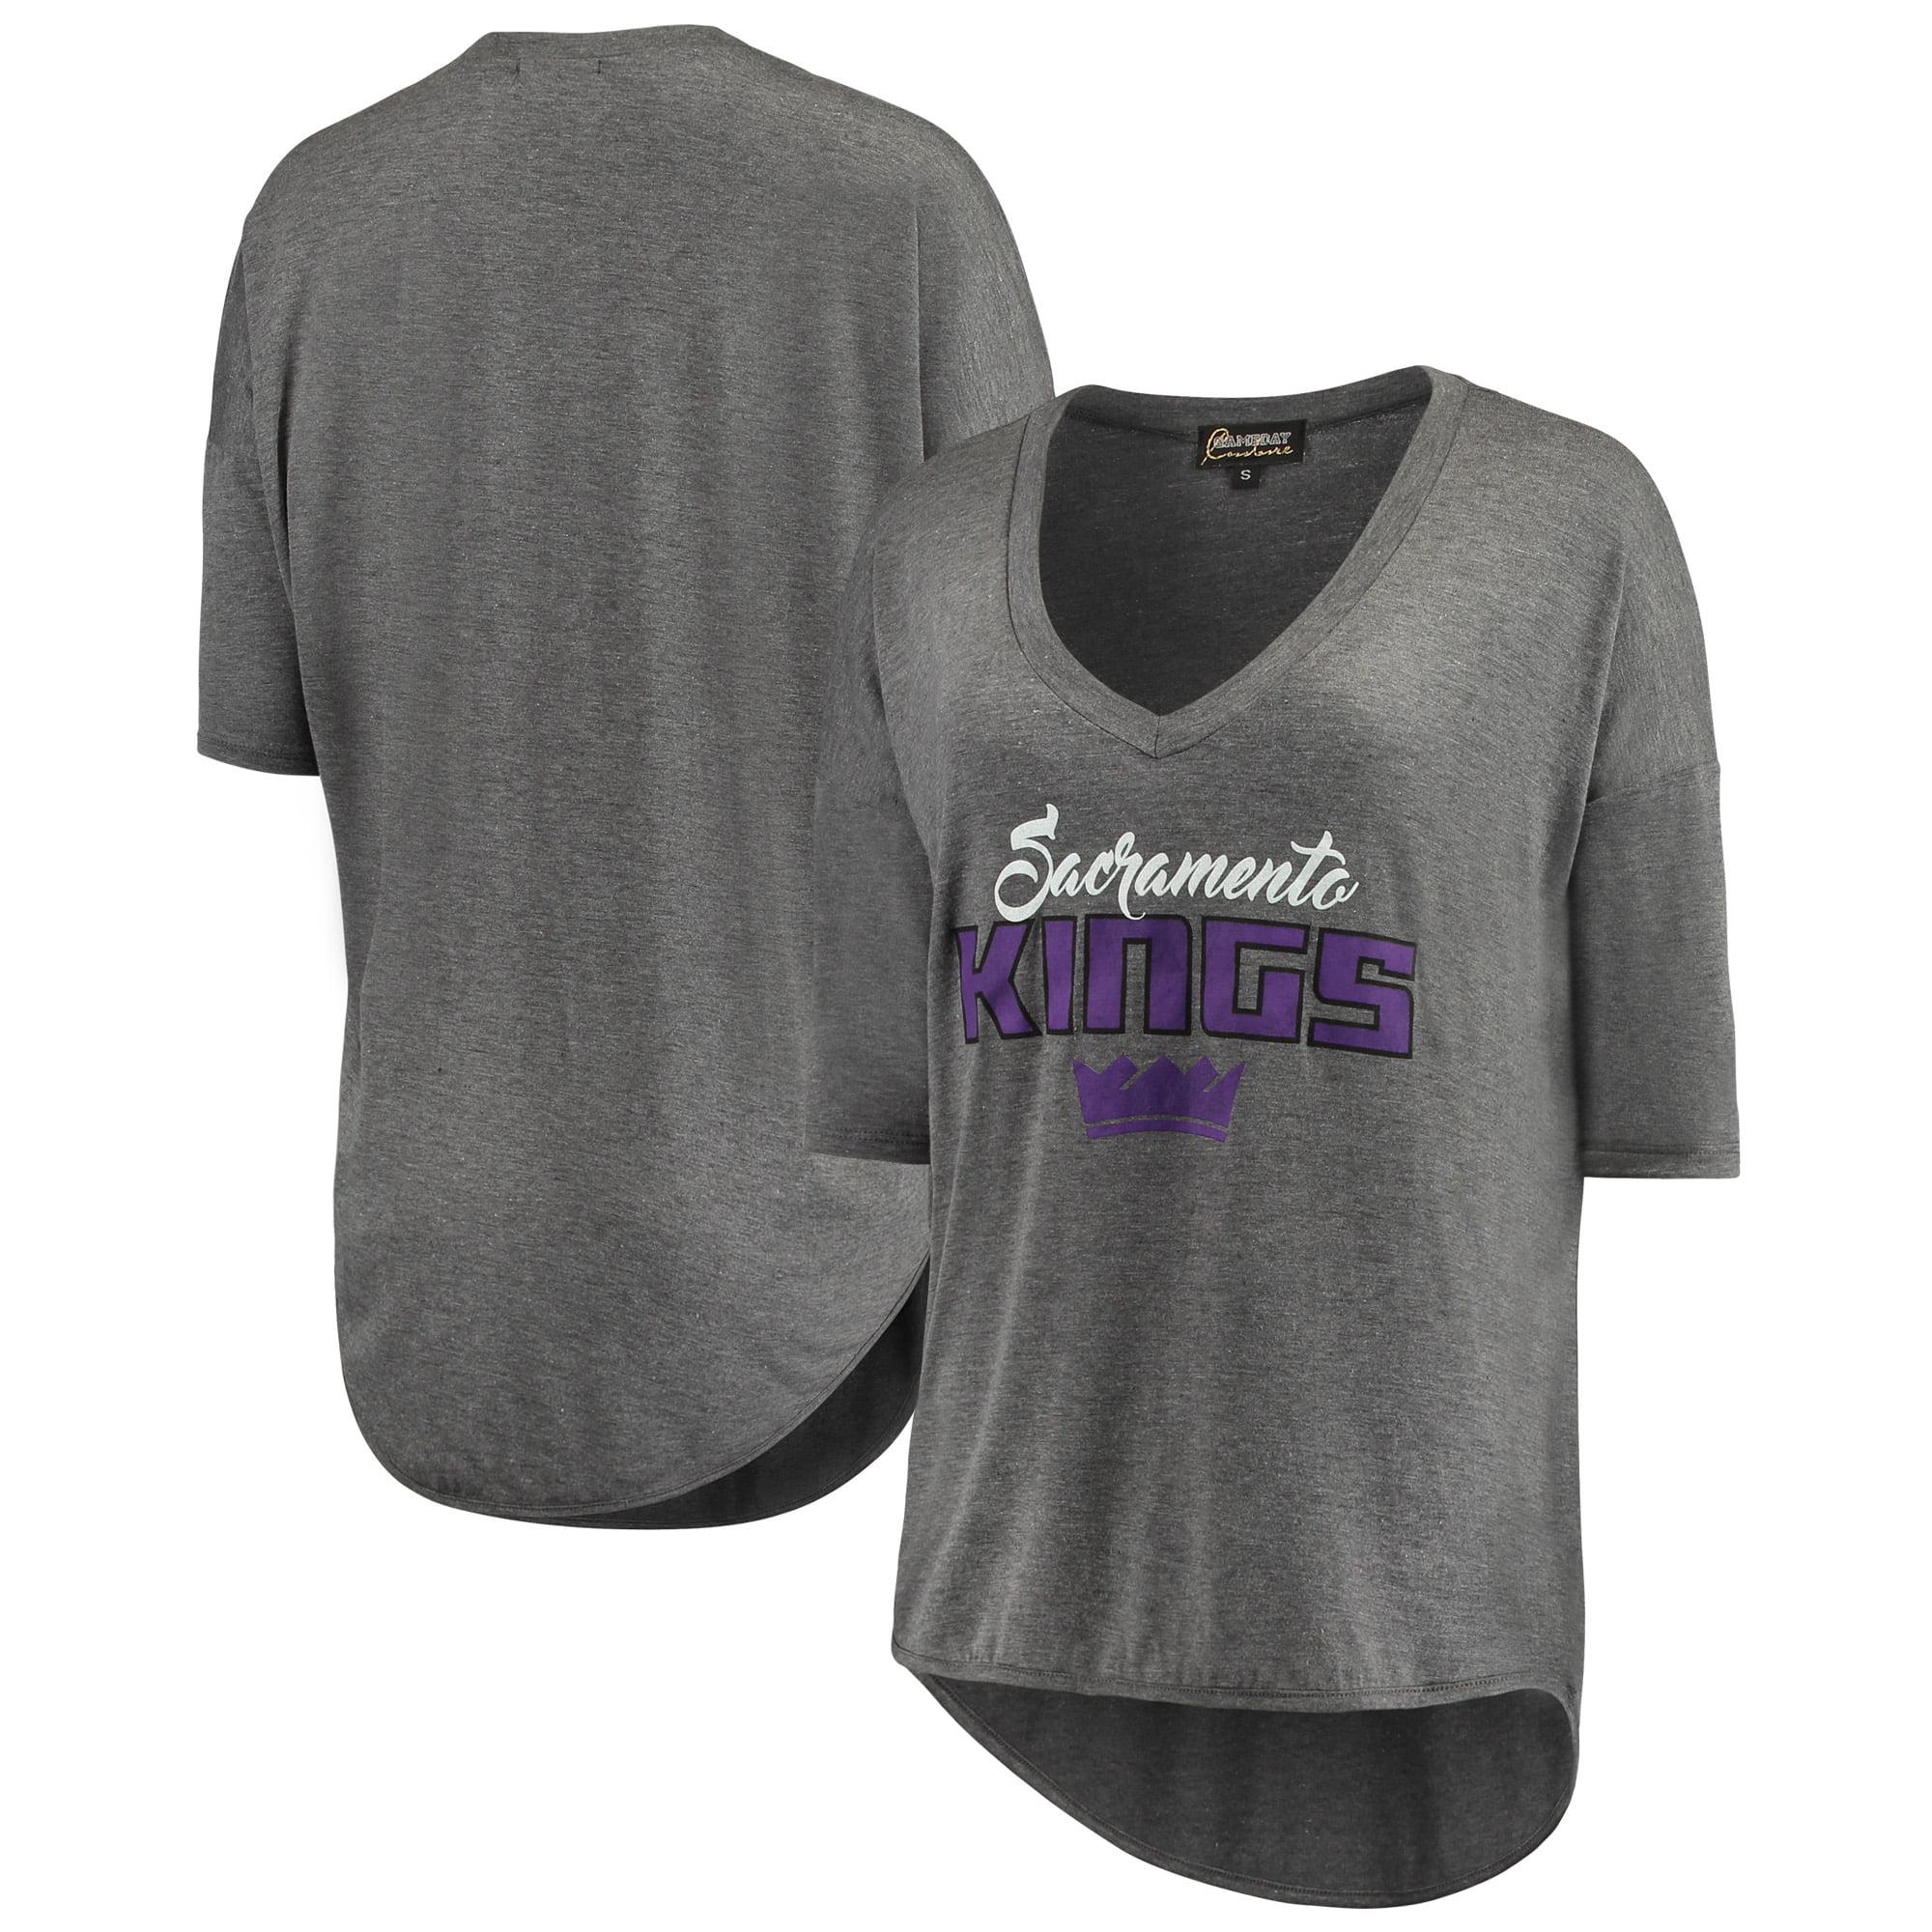 Sacramento Kings Women's Deep V-Neck Tri-Blend Half-Sleeve T-Shirt - Gray